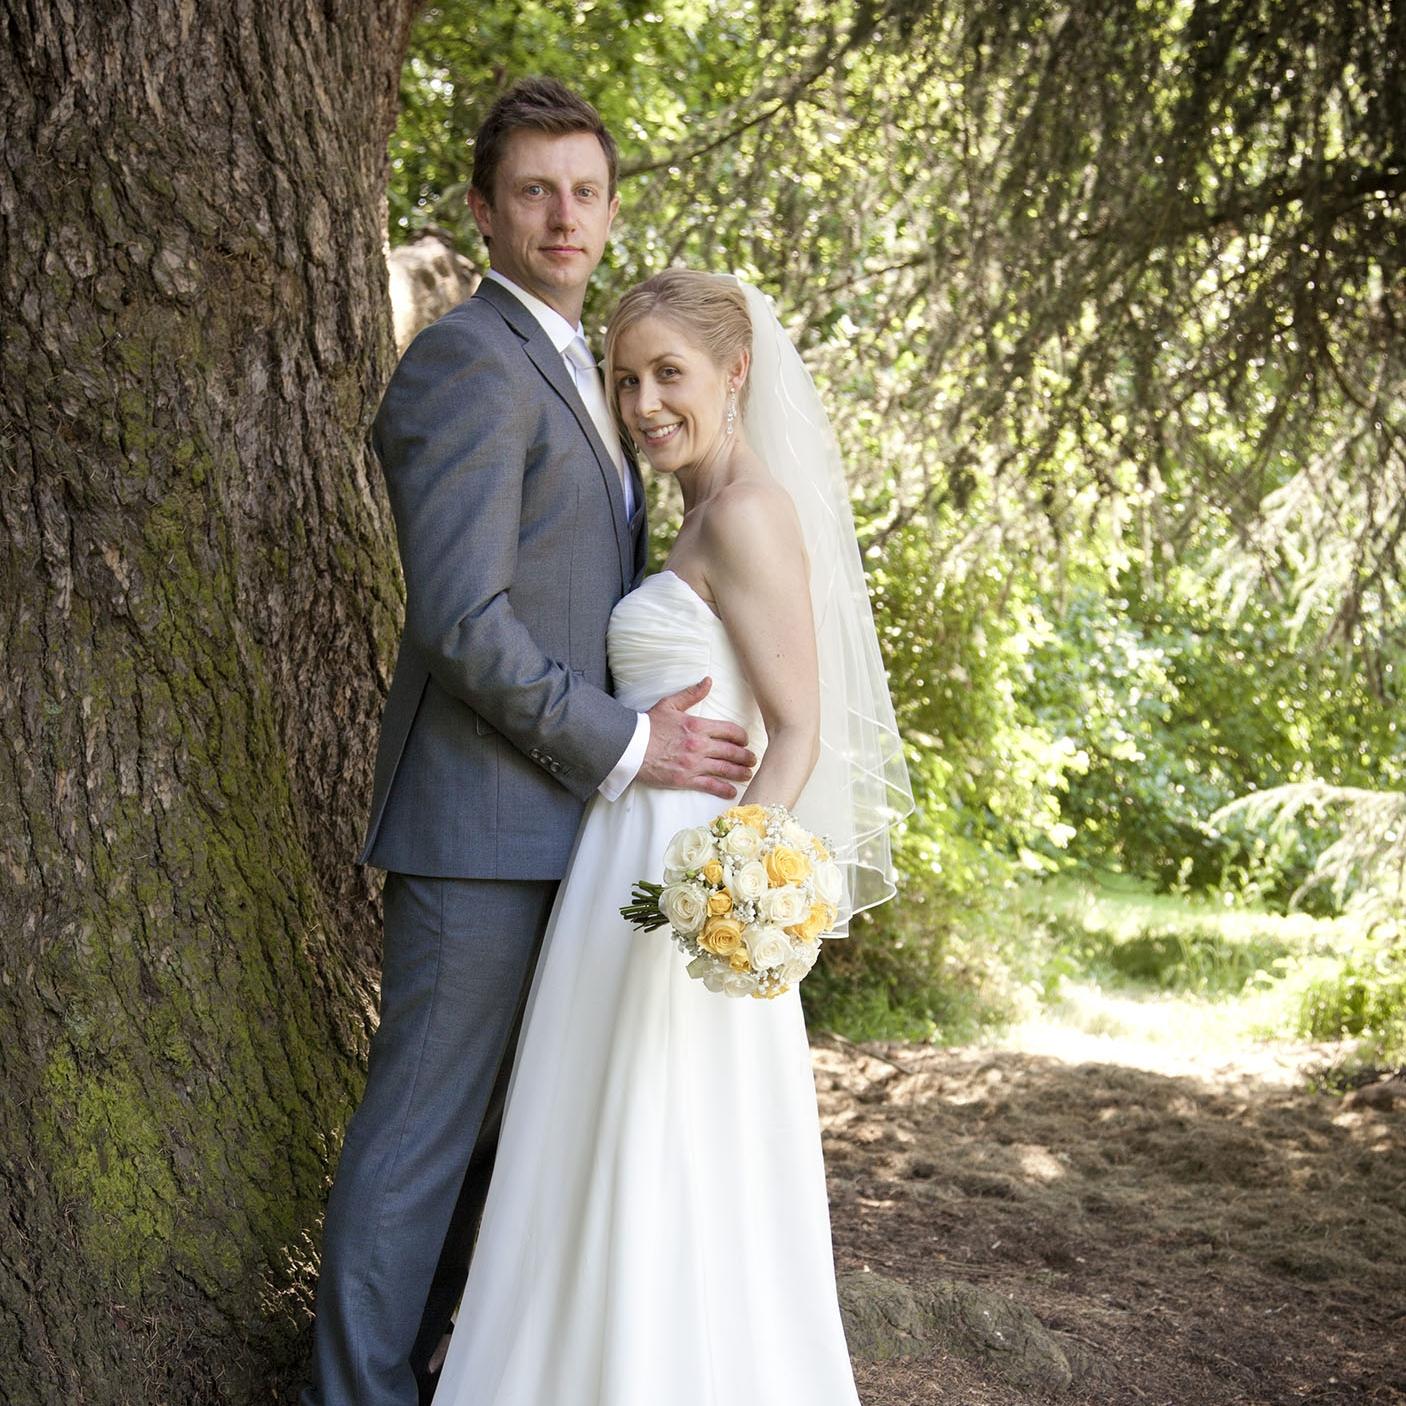 elizabethg_fineart_photography_hertfordshire_rachel_adam_wedding_highelmsmanor_34.jpg